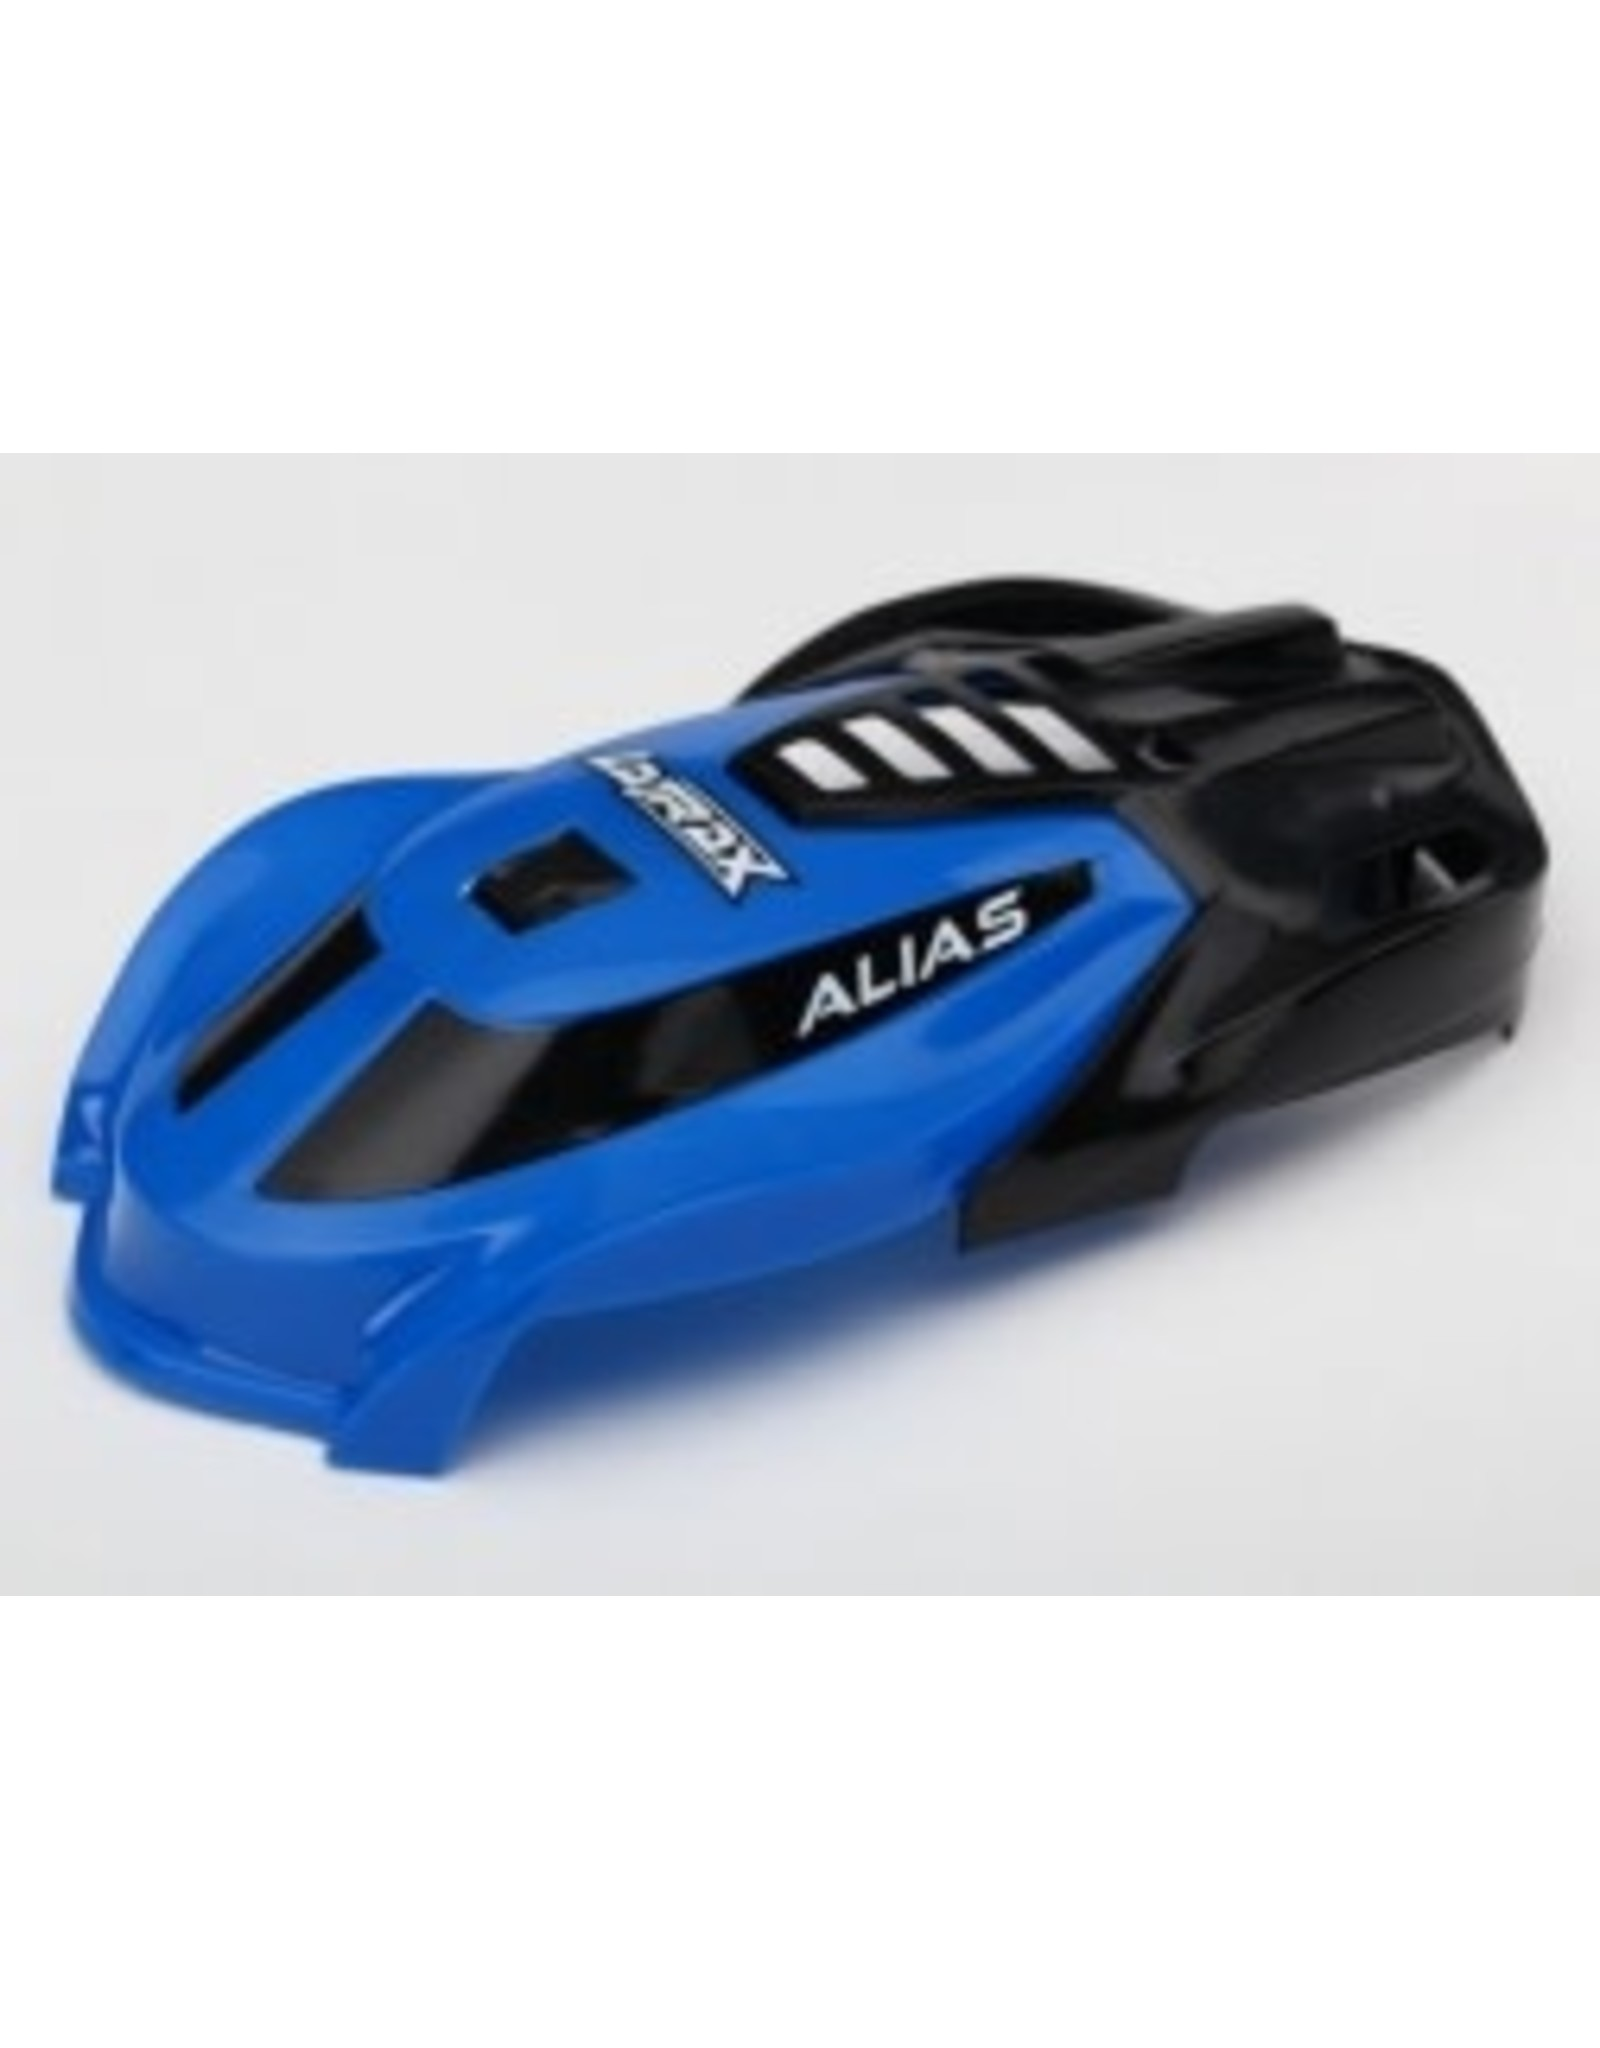 Latrax Canopy, Alias®, blue/ 1.6x5mm BCS (self-tapping) (3) Canopy, Alias, blue/ 1.6x5mm BCS (self-tapping) (3)